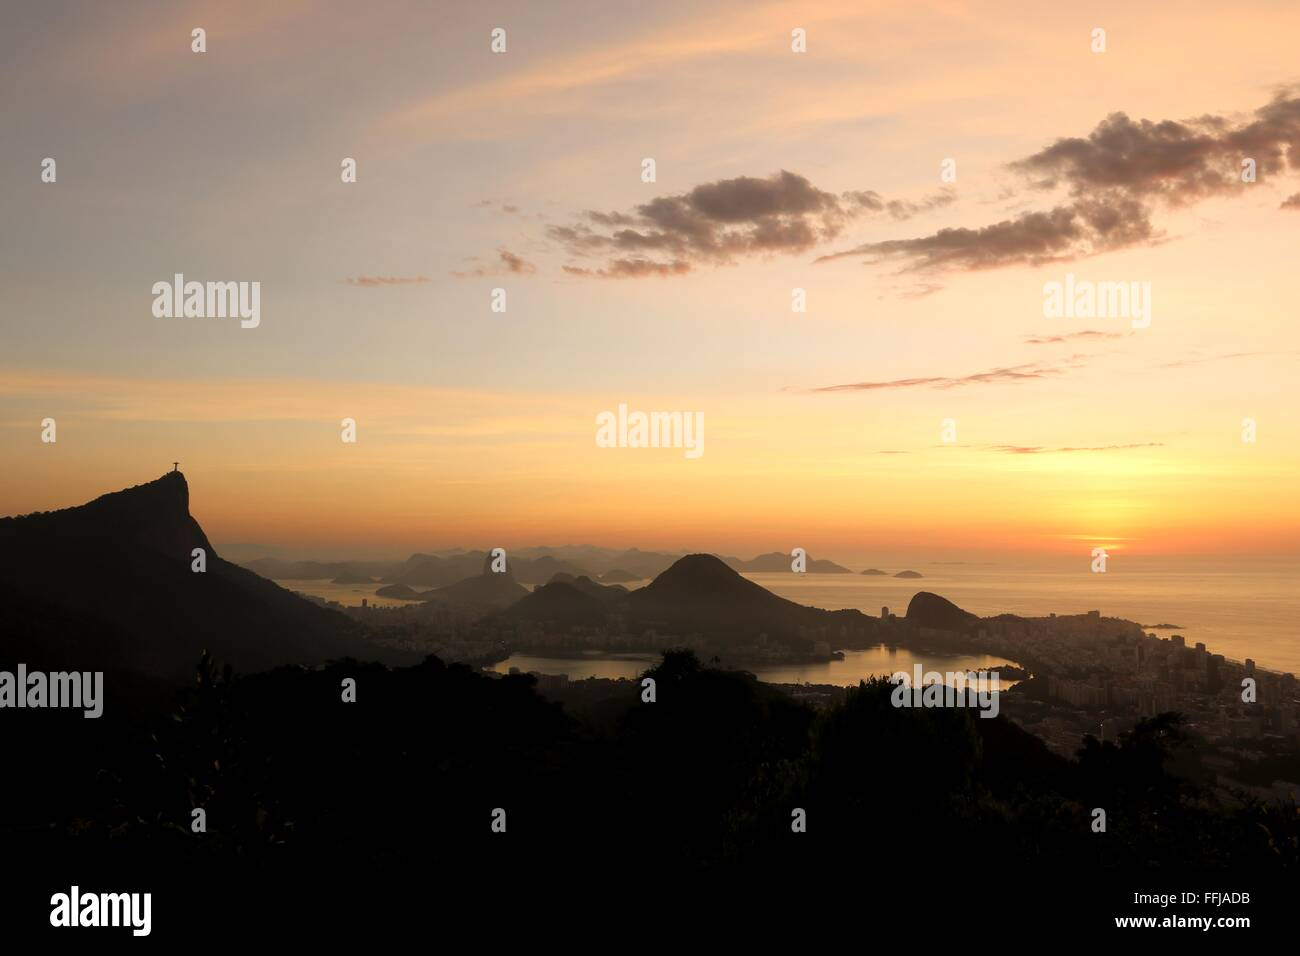 Rio de Janeiro, Brazil, 14th February. Rio de Janeiro at sunrise, seen from Vista Chinesa (Chinese Belvedere) in Stock Photo